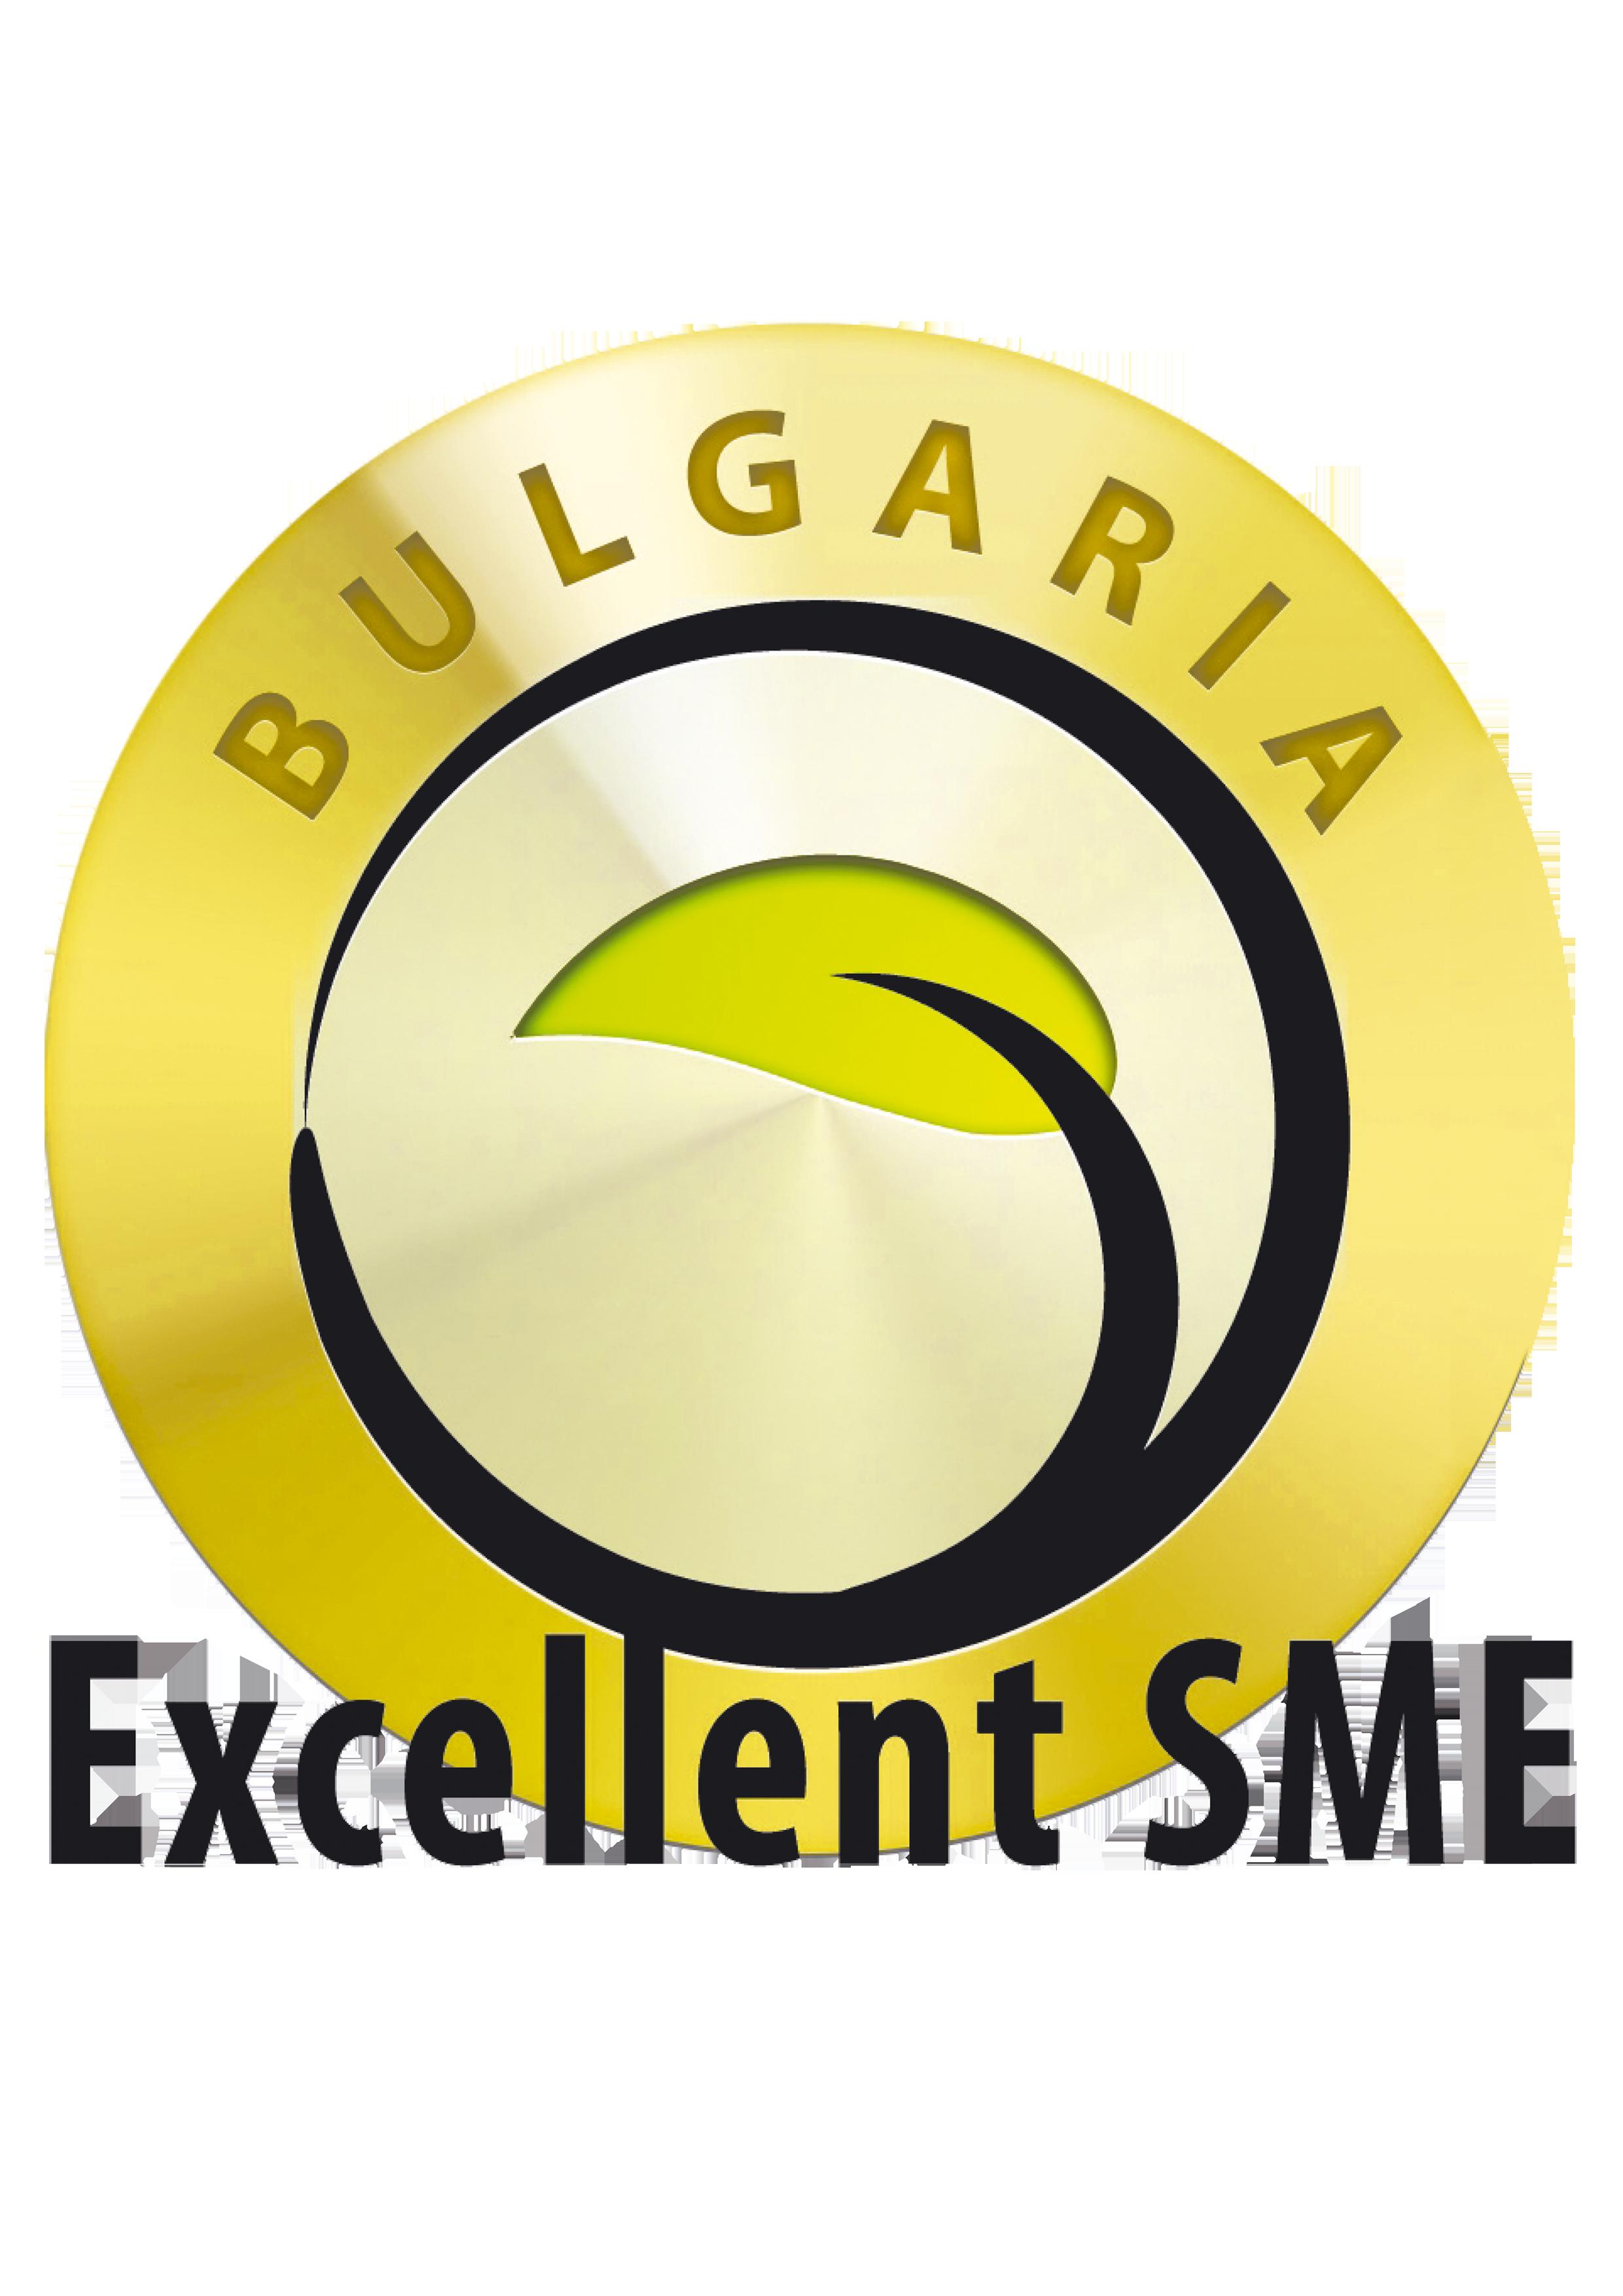 Excellent SME (Small and medium enterprises)